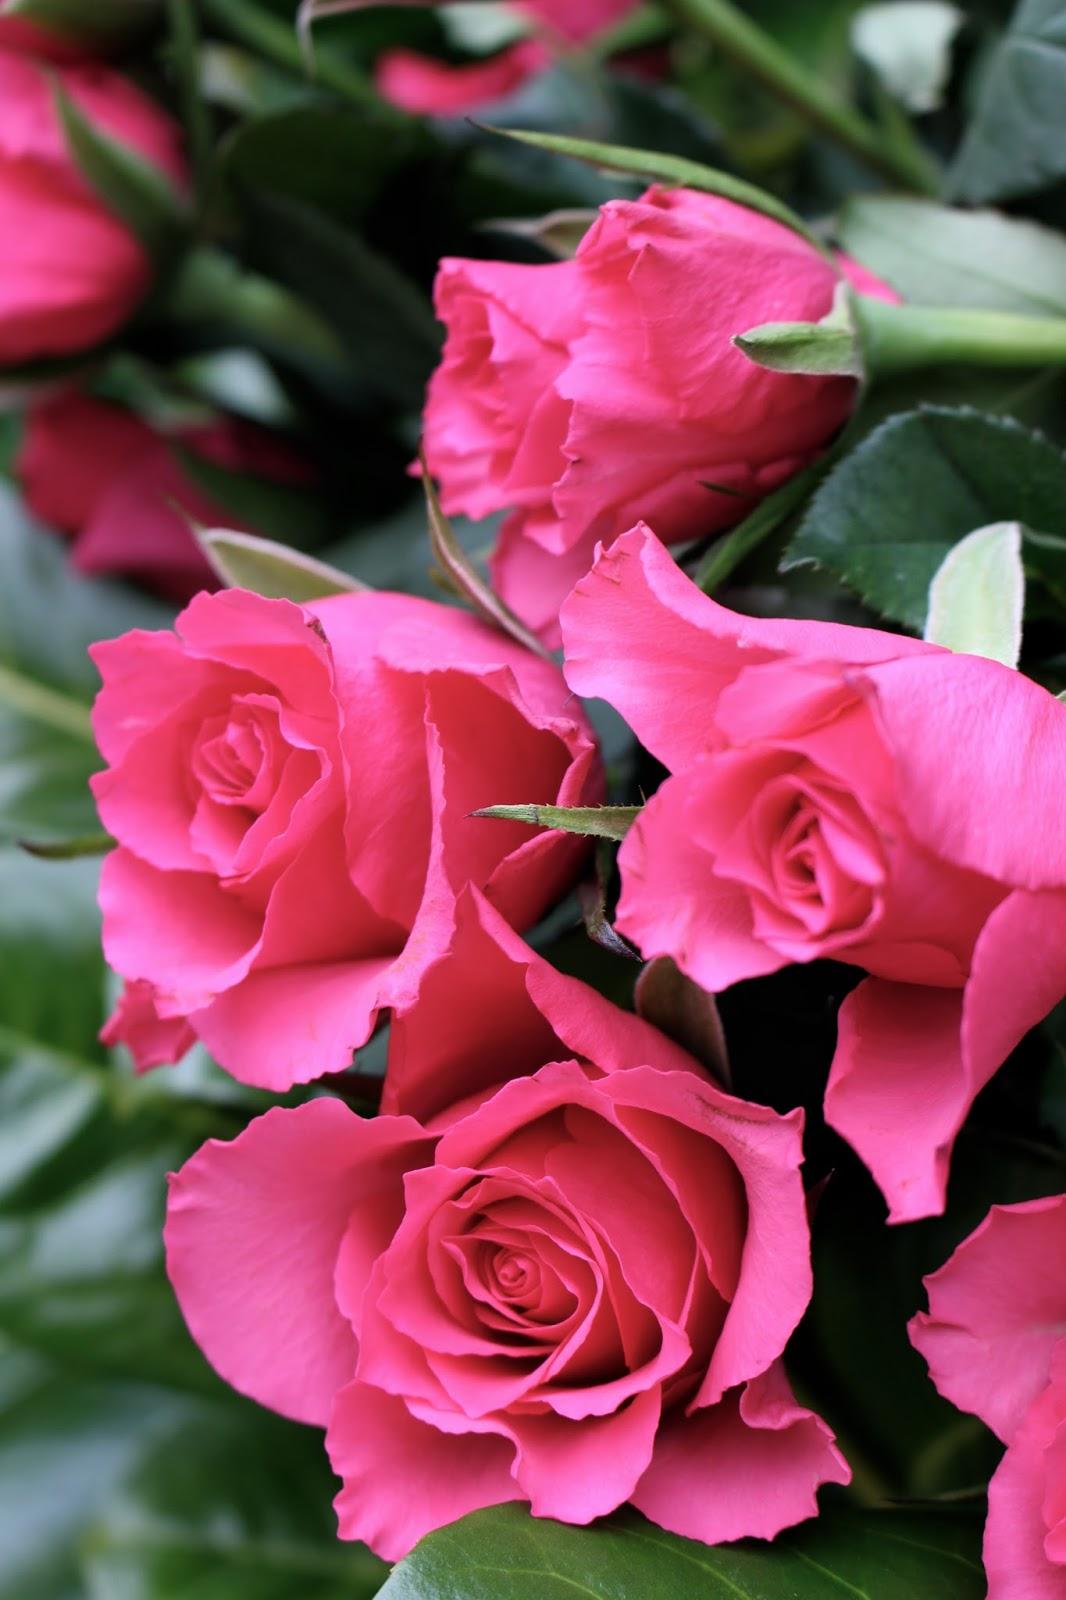 flower nature lifestyle photography blogger